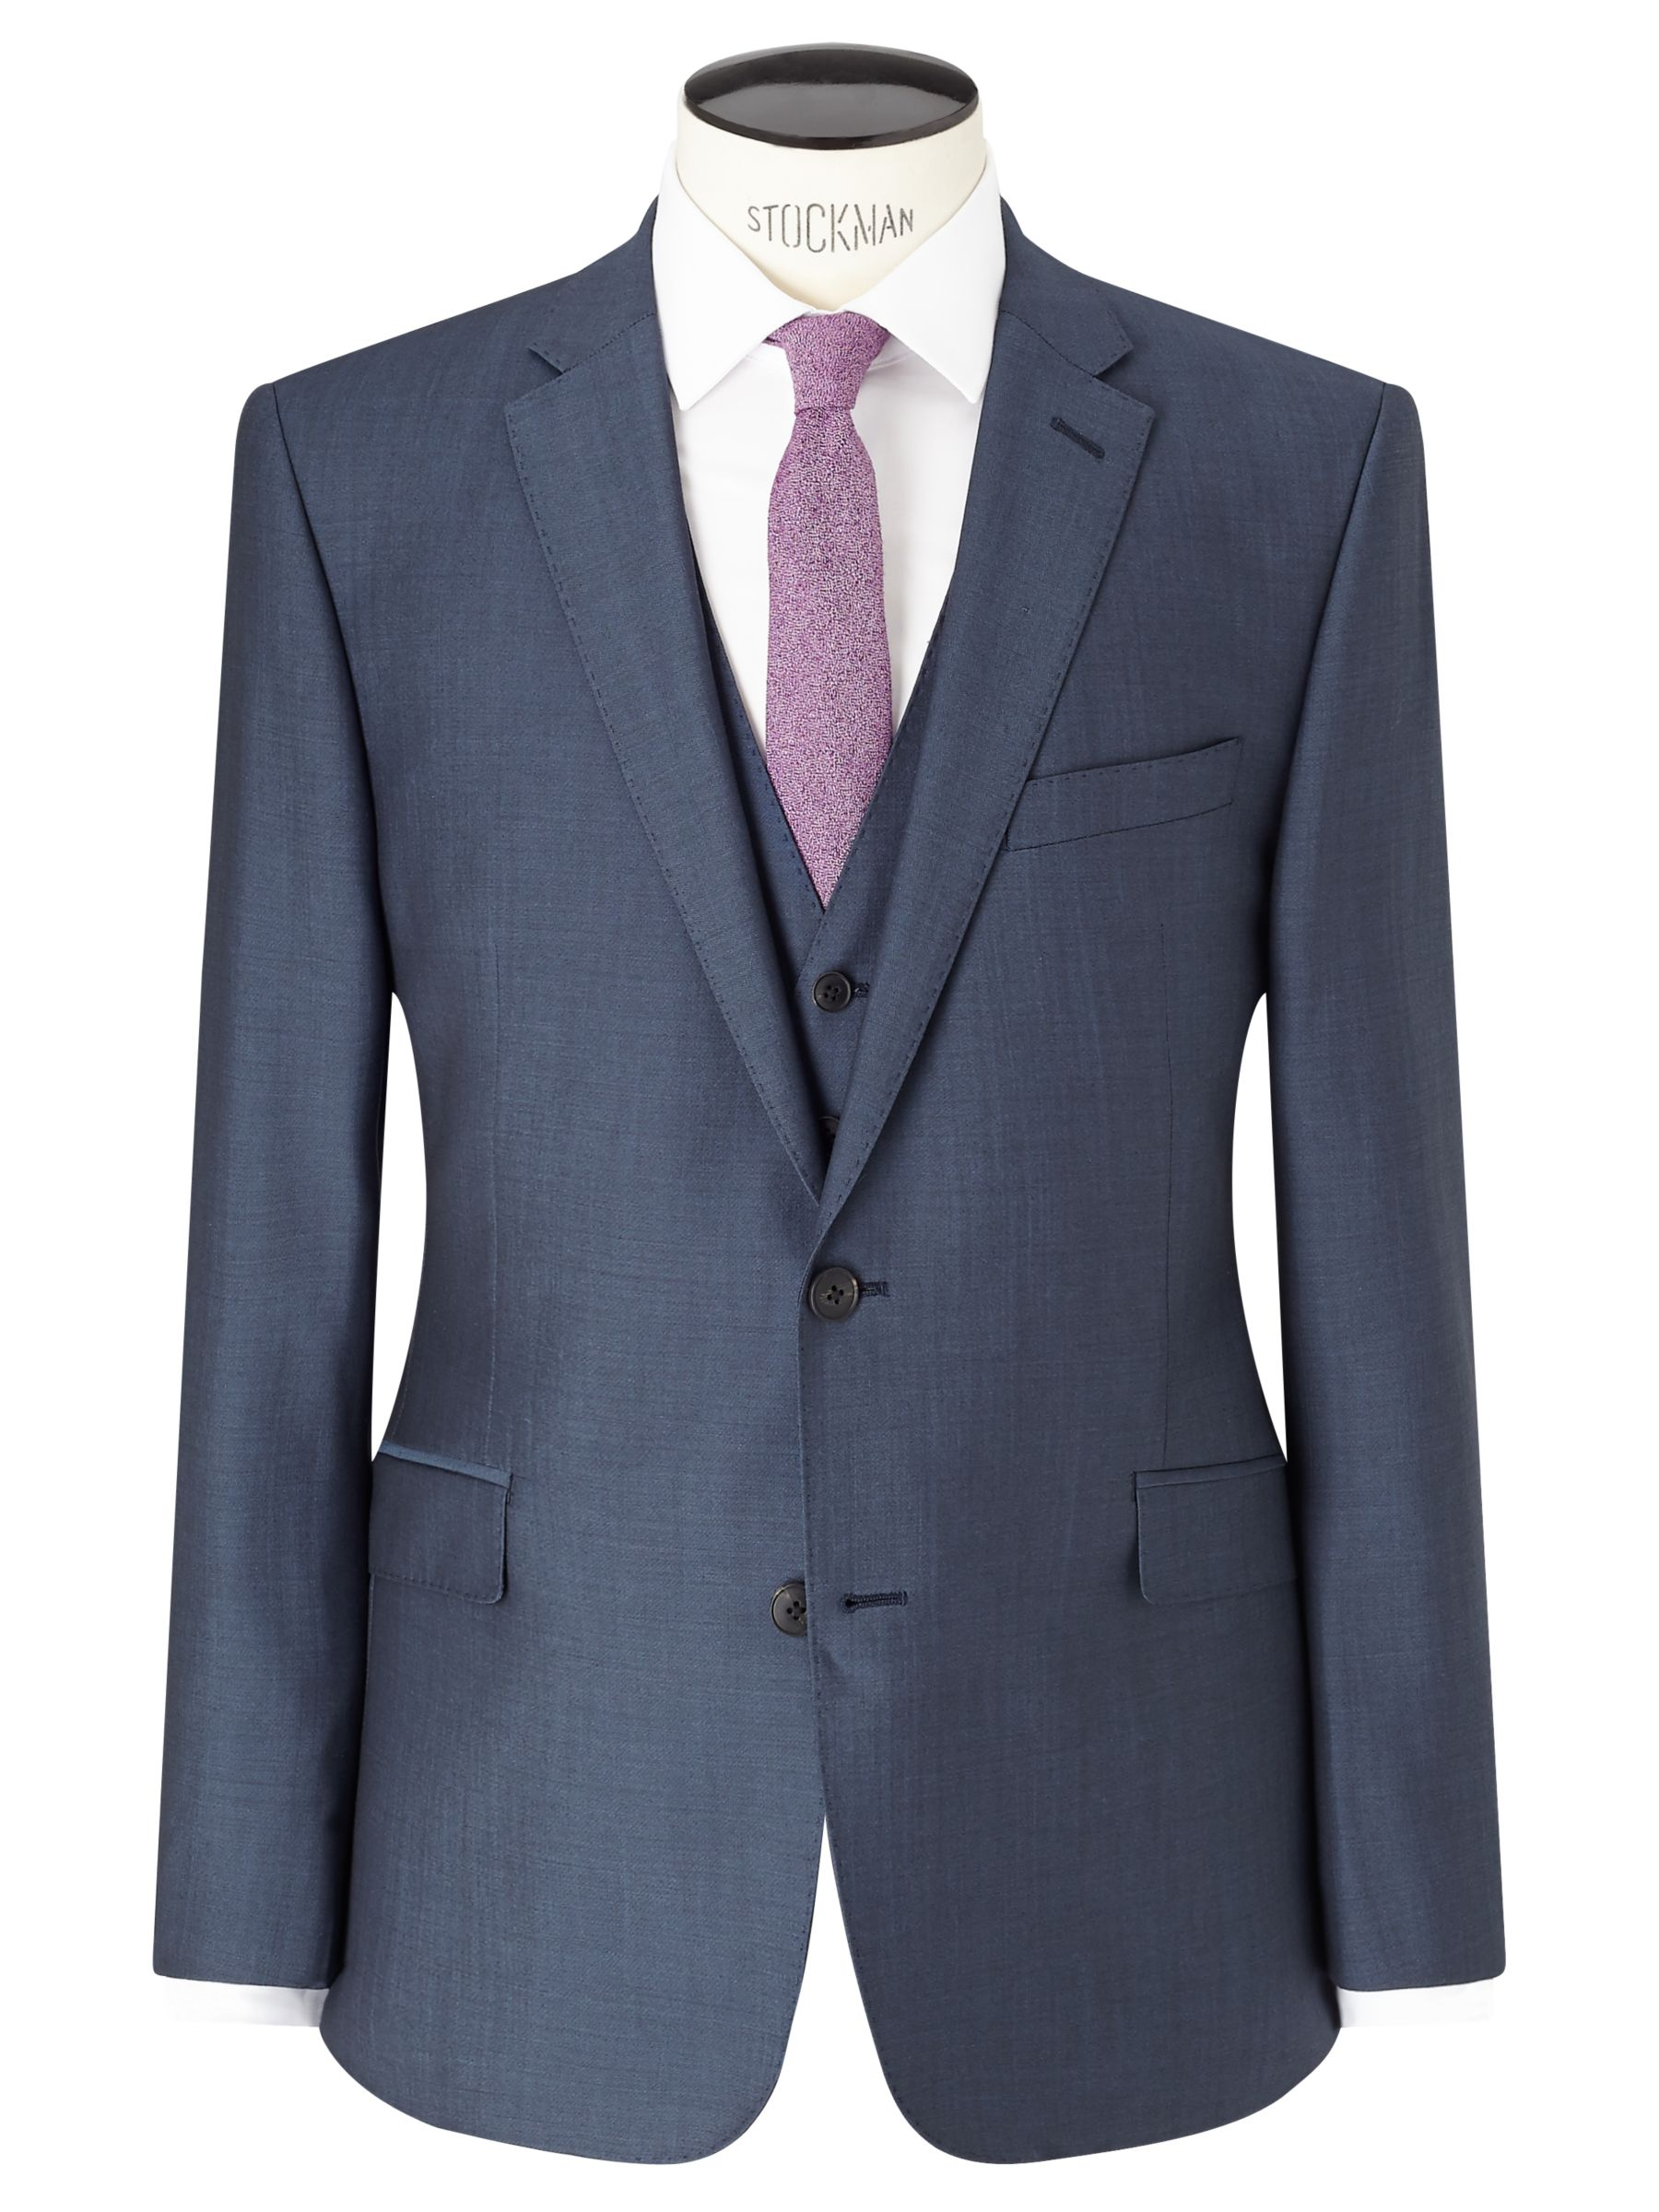 Richard James Mayfair Richard James Mayfair Wool Mohair Slim Fit Suit Jacket, Blue Steel